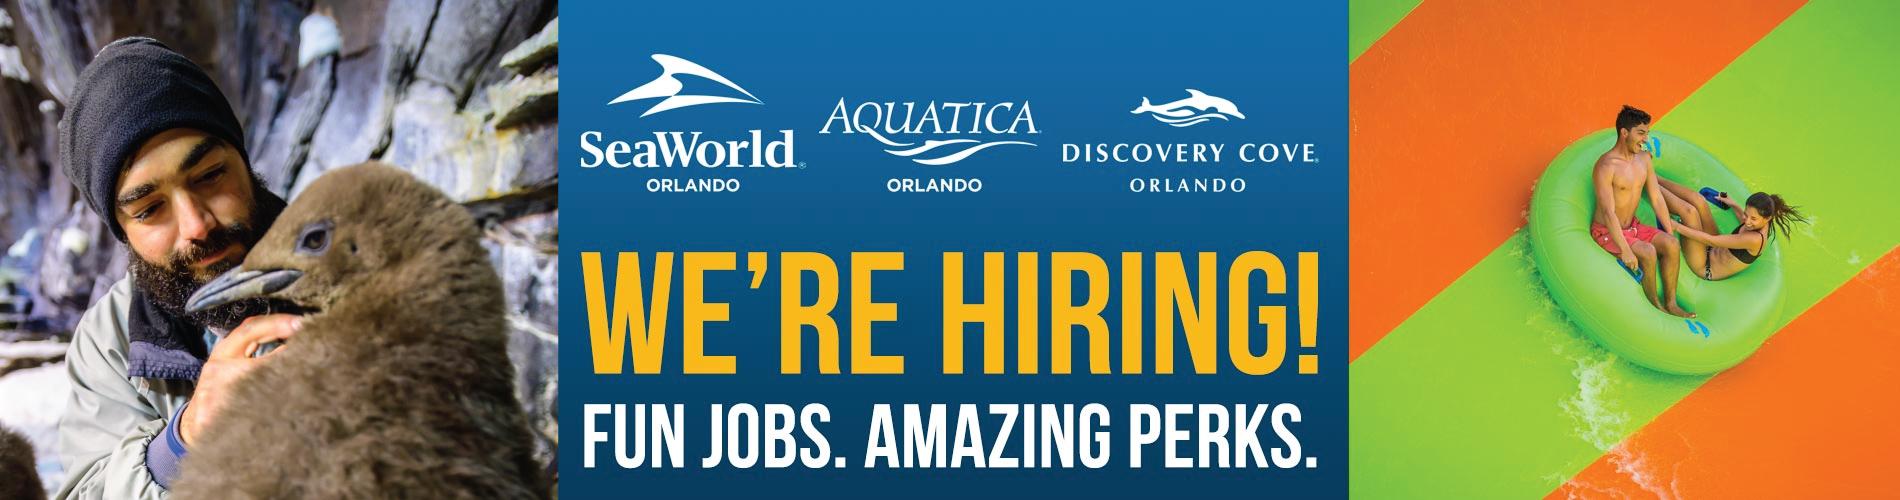 We're Hiring! Fun Jobs. Amazing Perks.